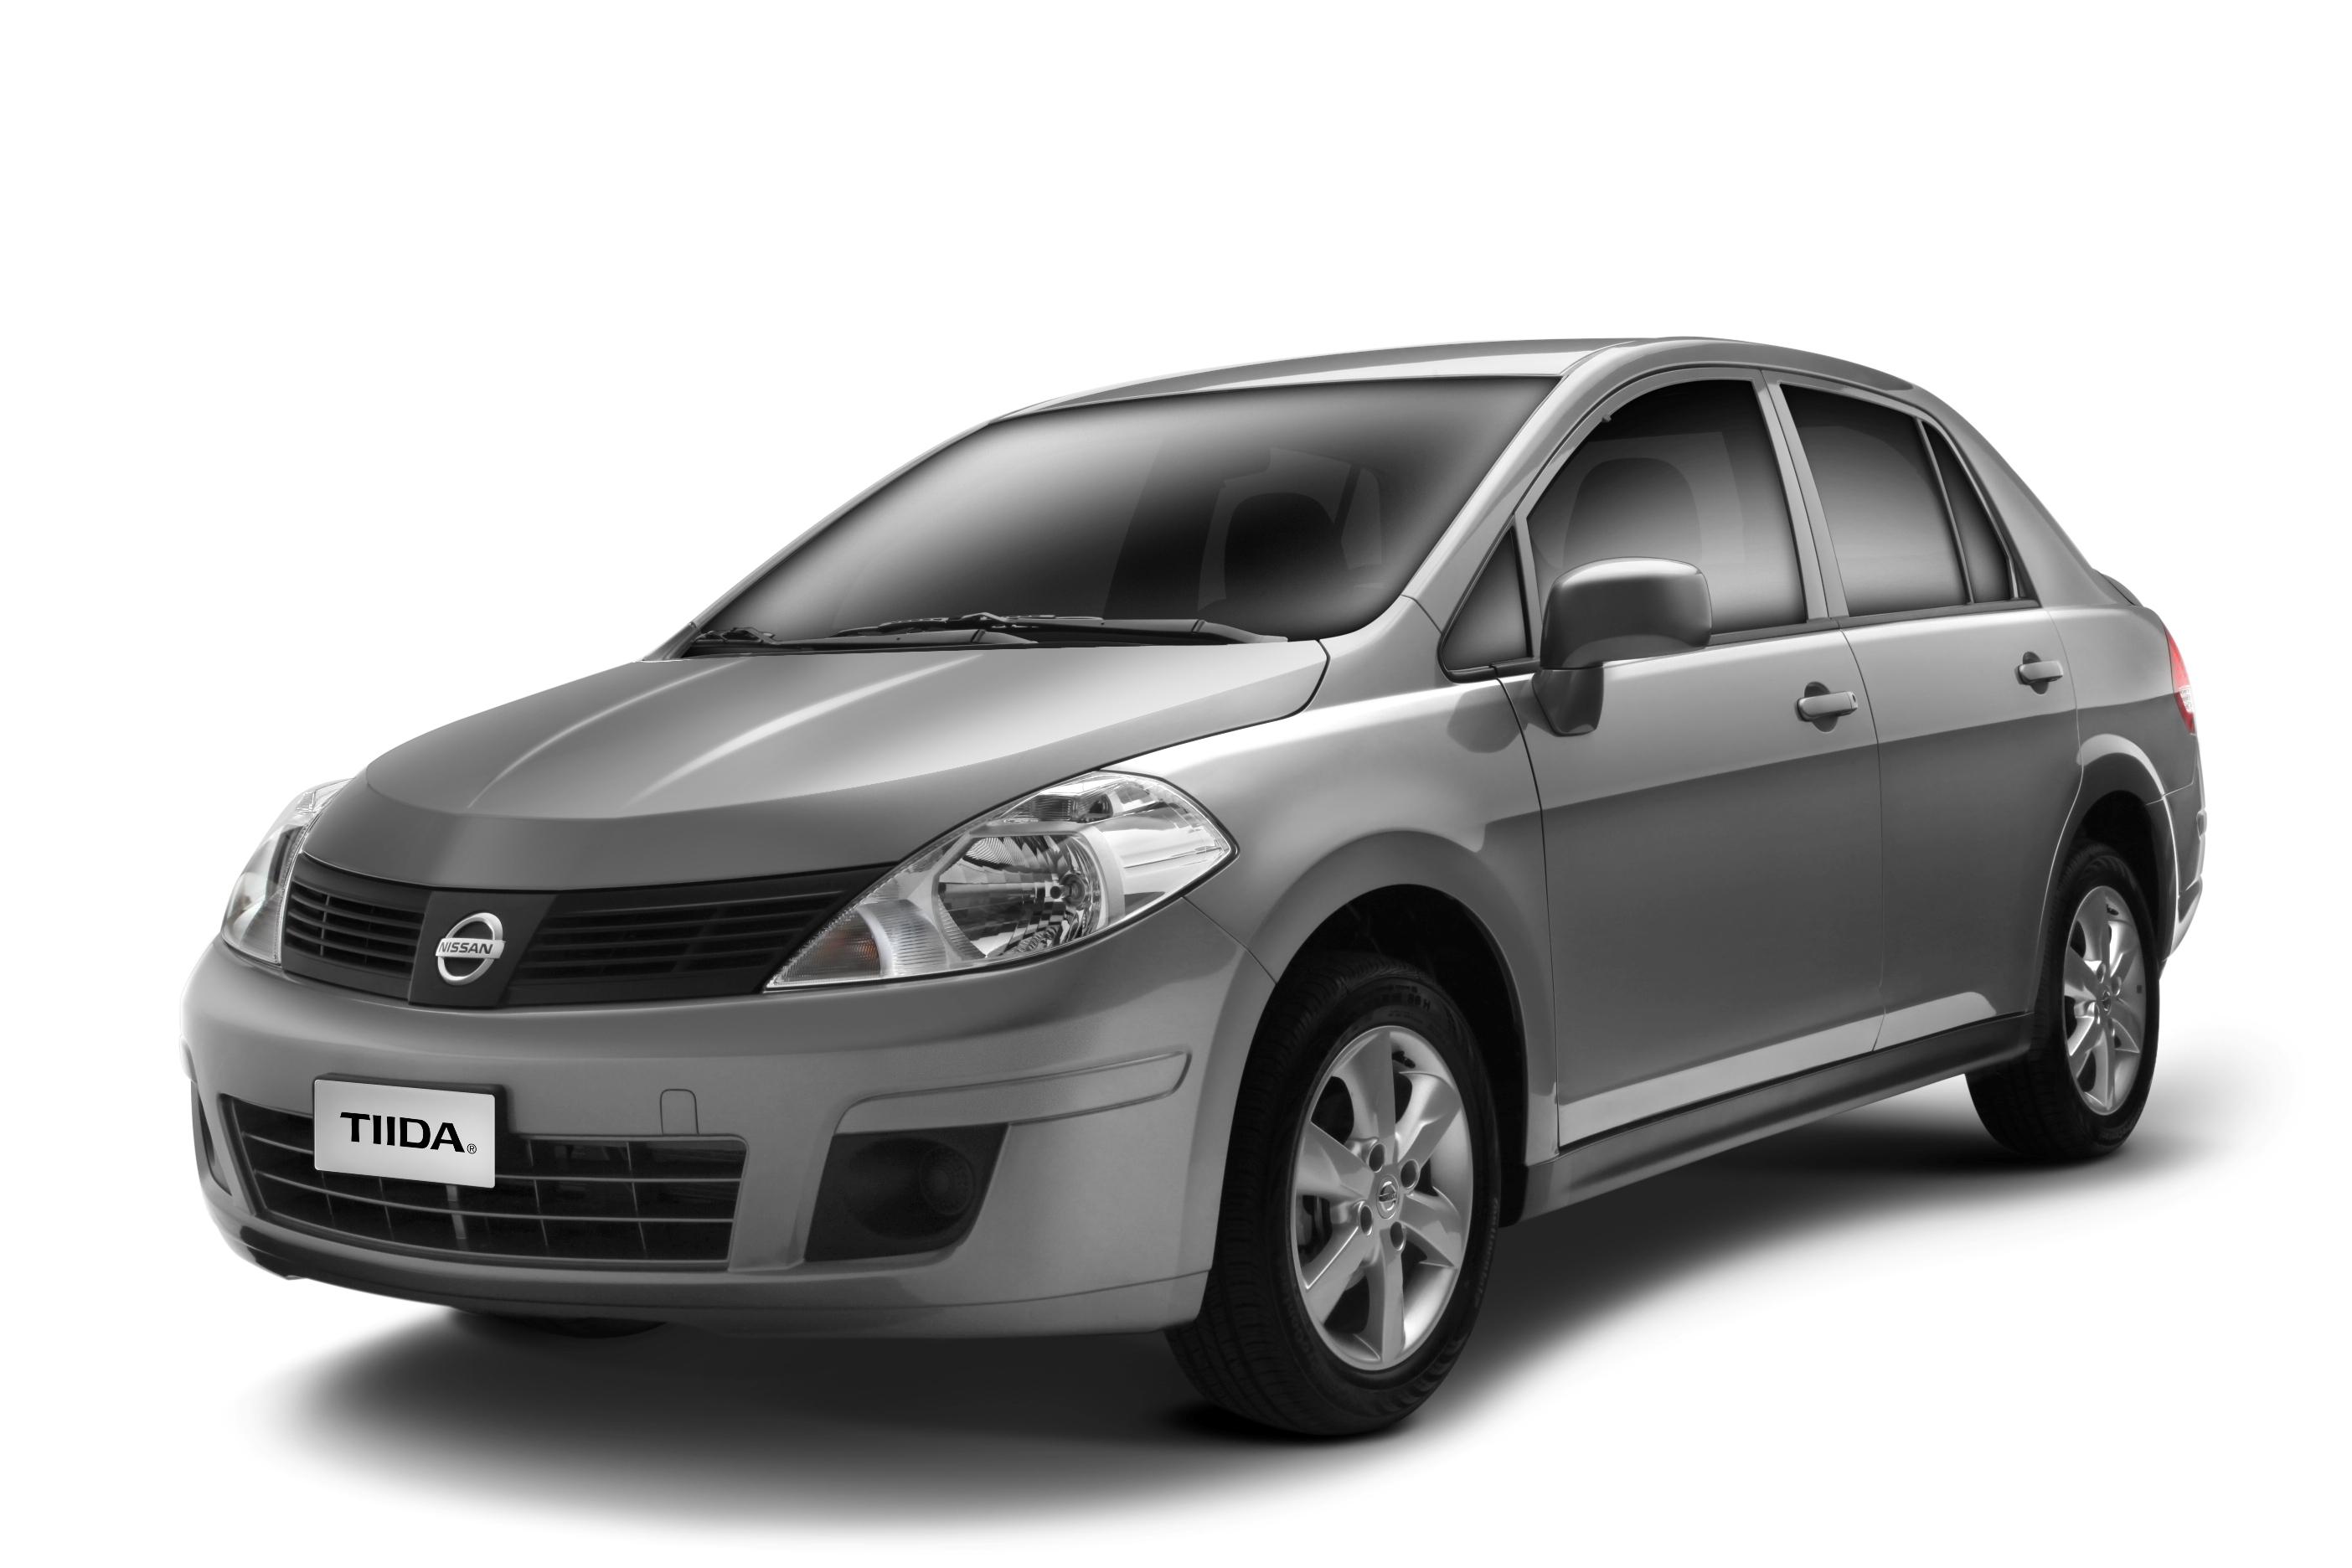 autos awd wells auto watch gt sale line youtube sportage for kia lifestyle at crdi tunbridge